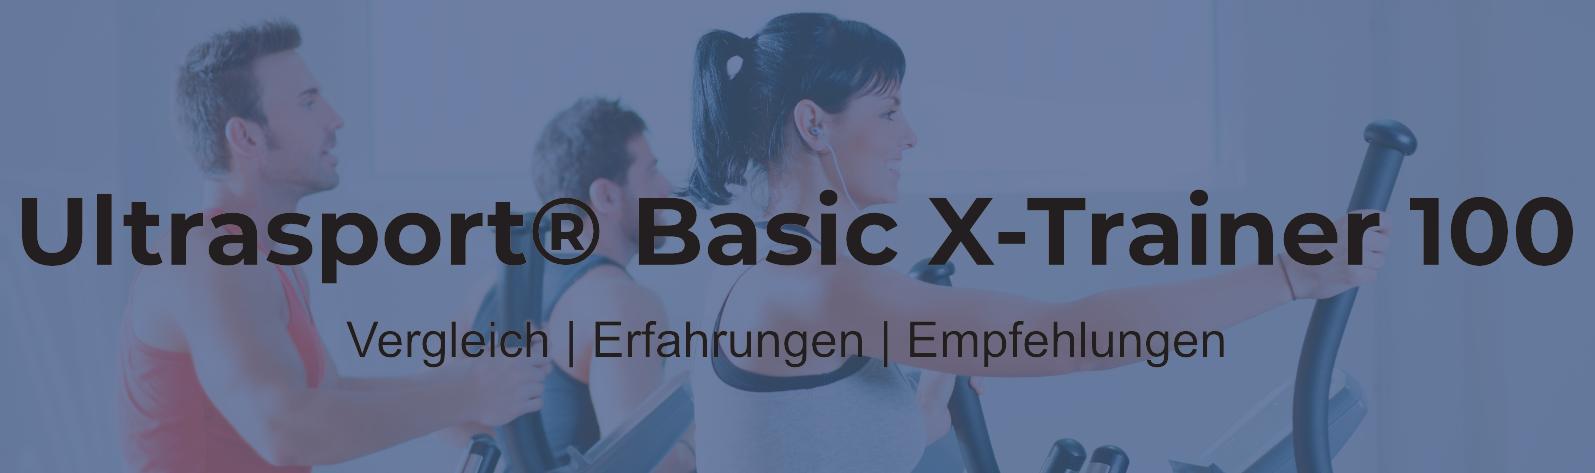 Basic X-Trainer 100